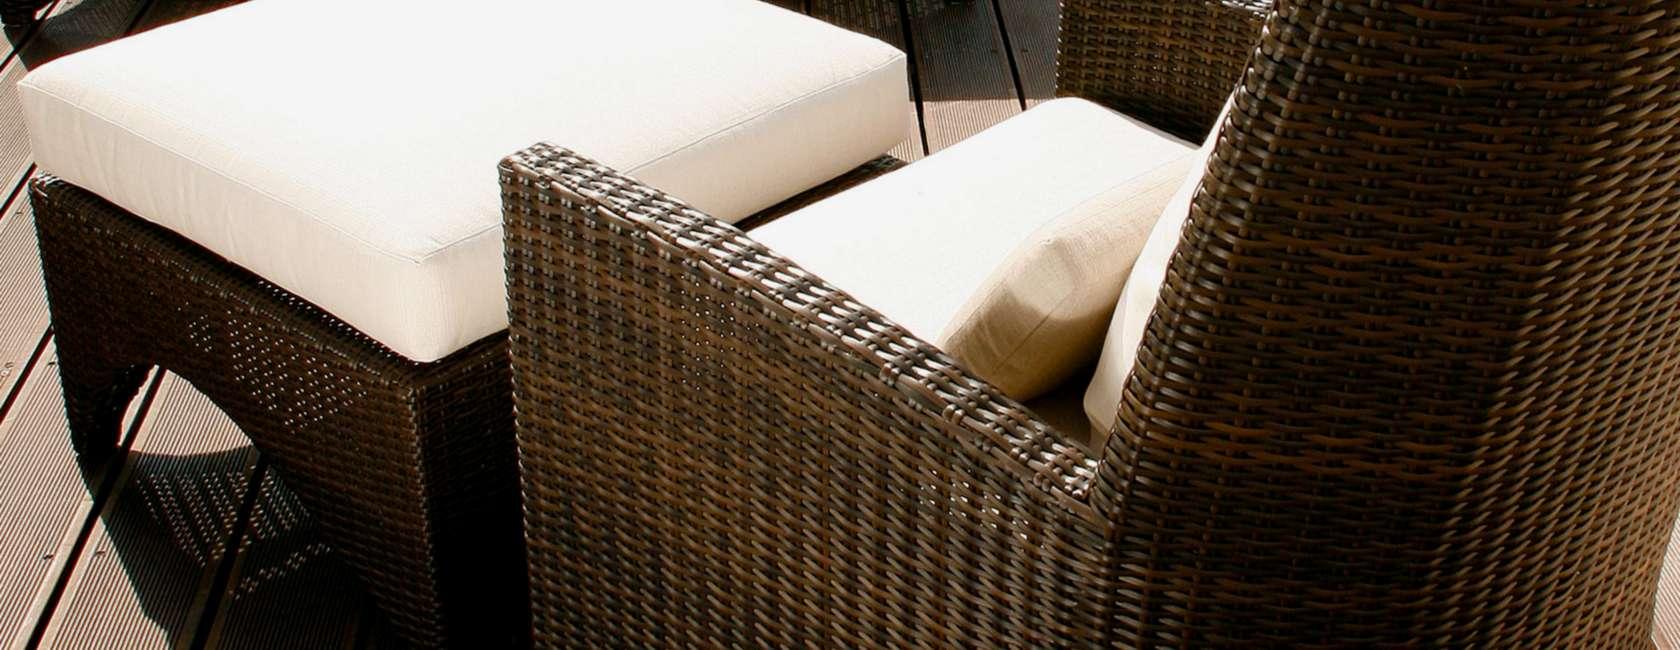 Barlow Tyrie Savannah Outdoor Furniture at John Lewis & Partners